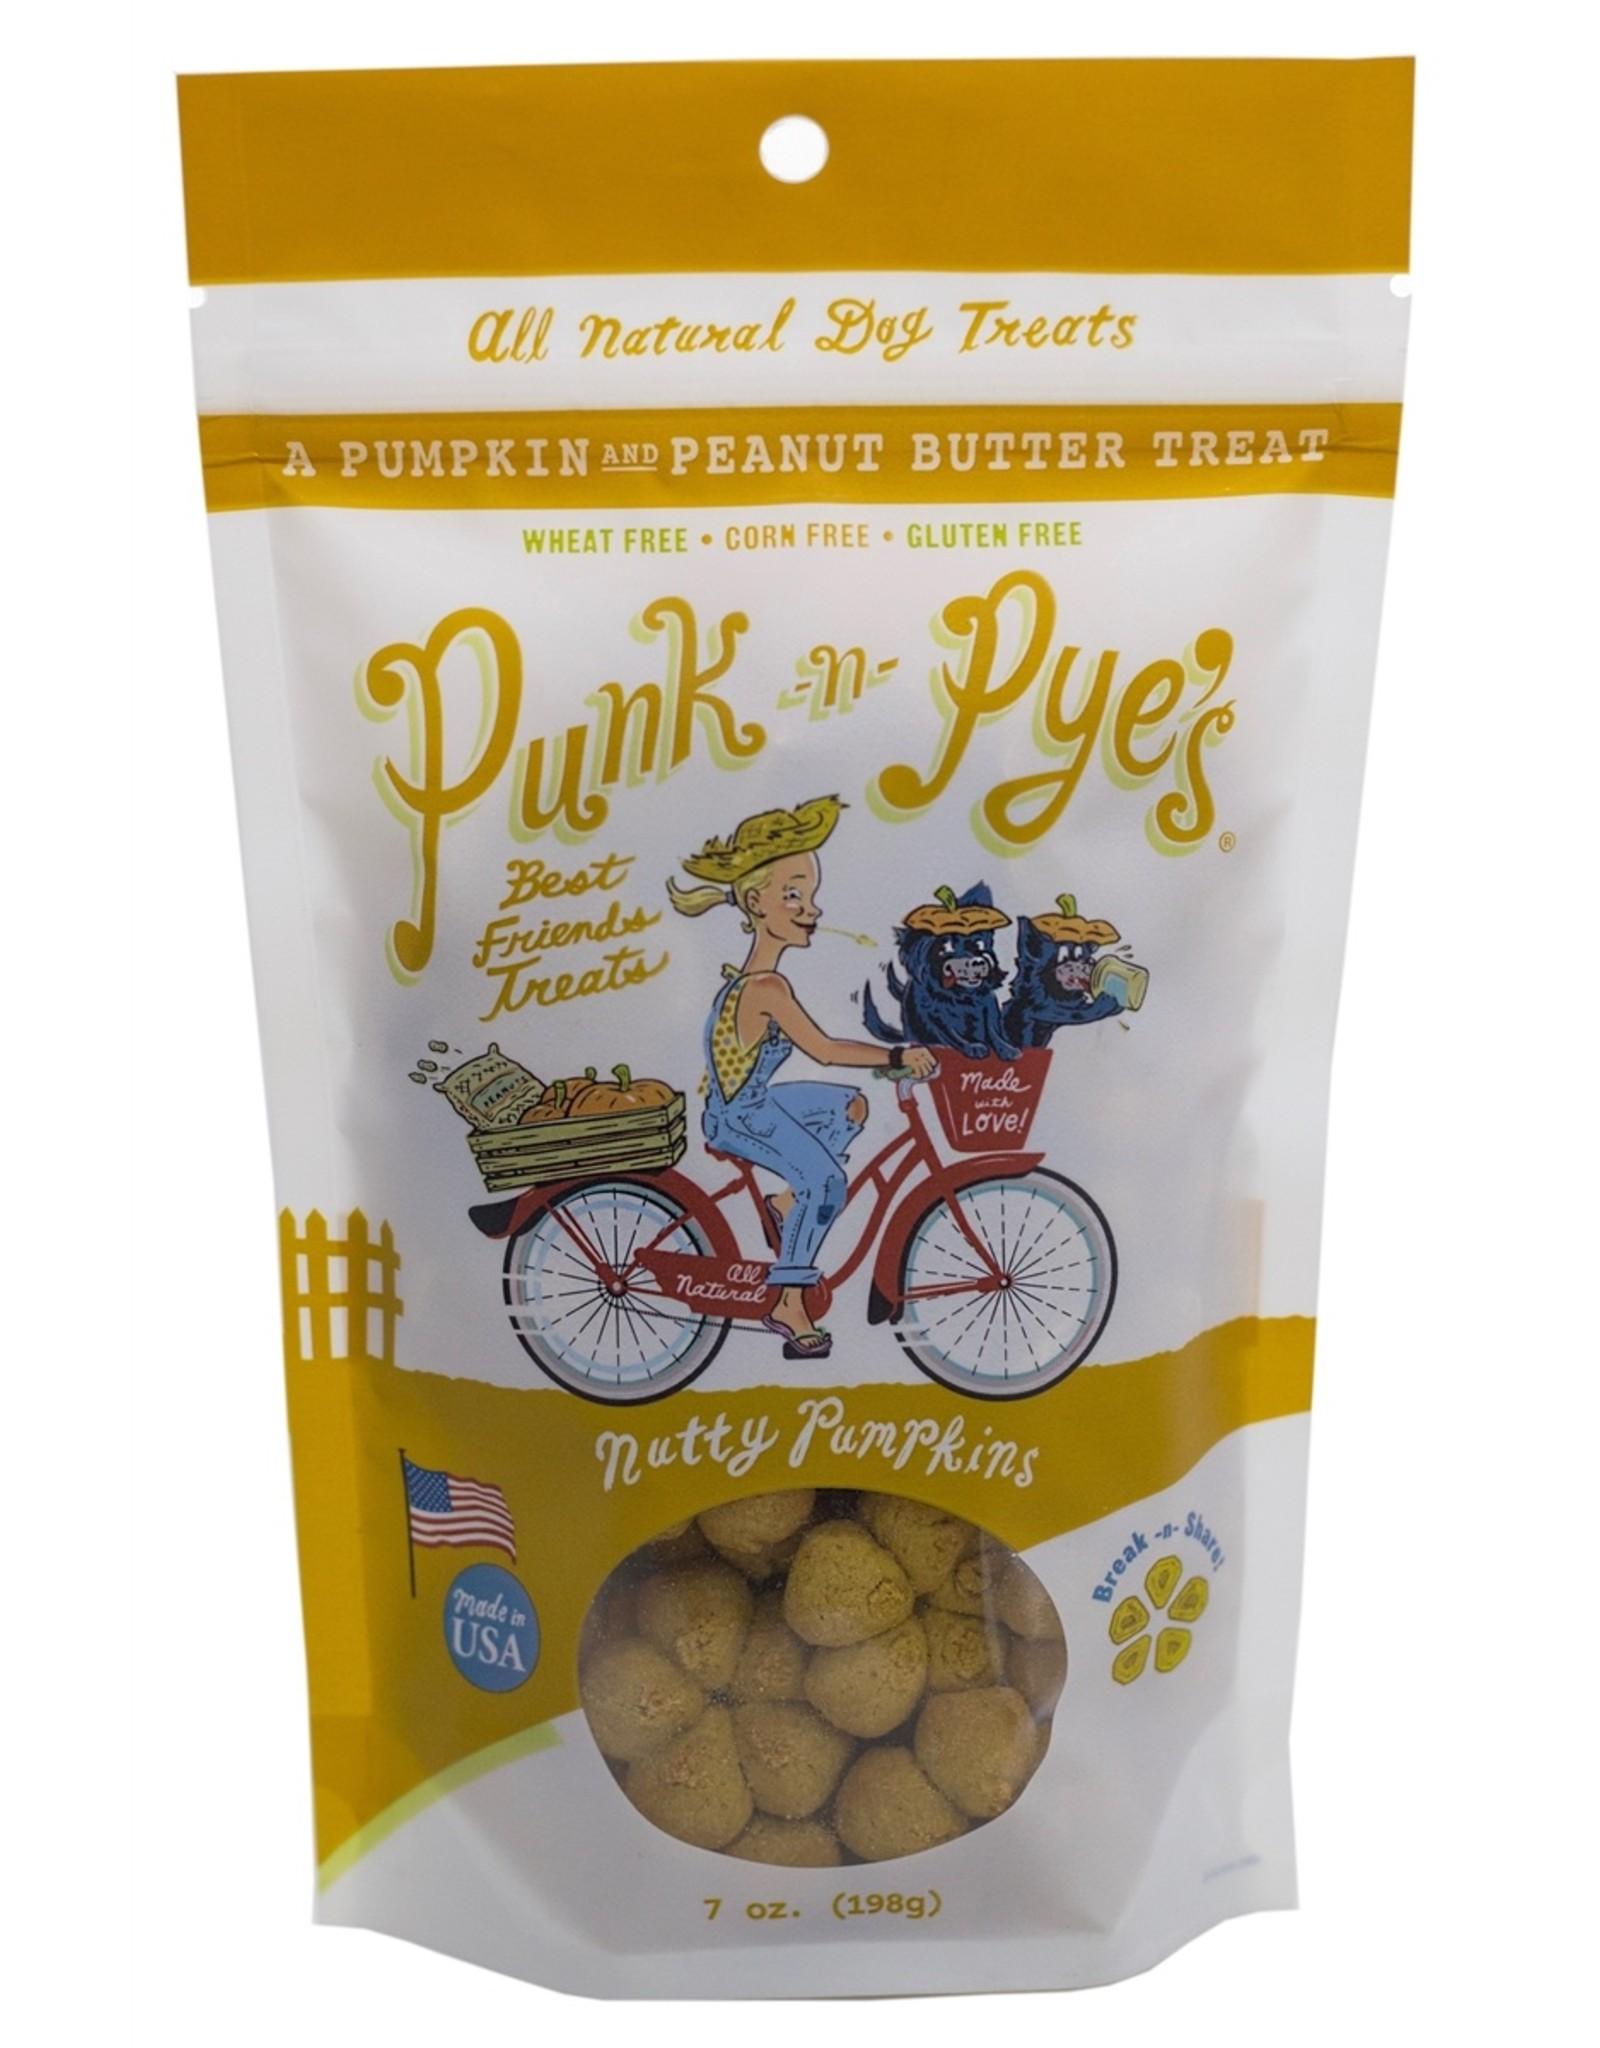 Punk-N-Pye's PUNK-N-PYE'S NUTTY PUMPKINS PUMPKIN & PEANUT BUTTER DOG TREATS 7OZ